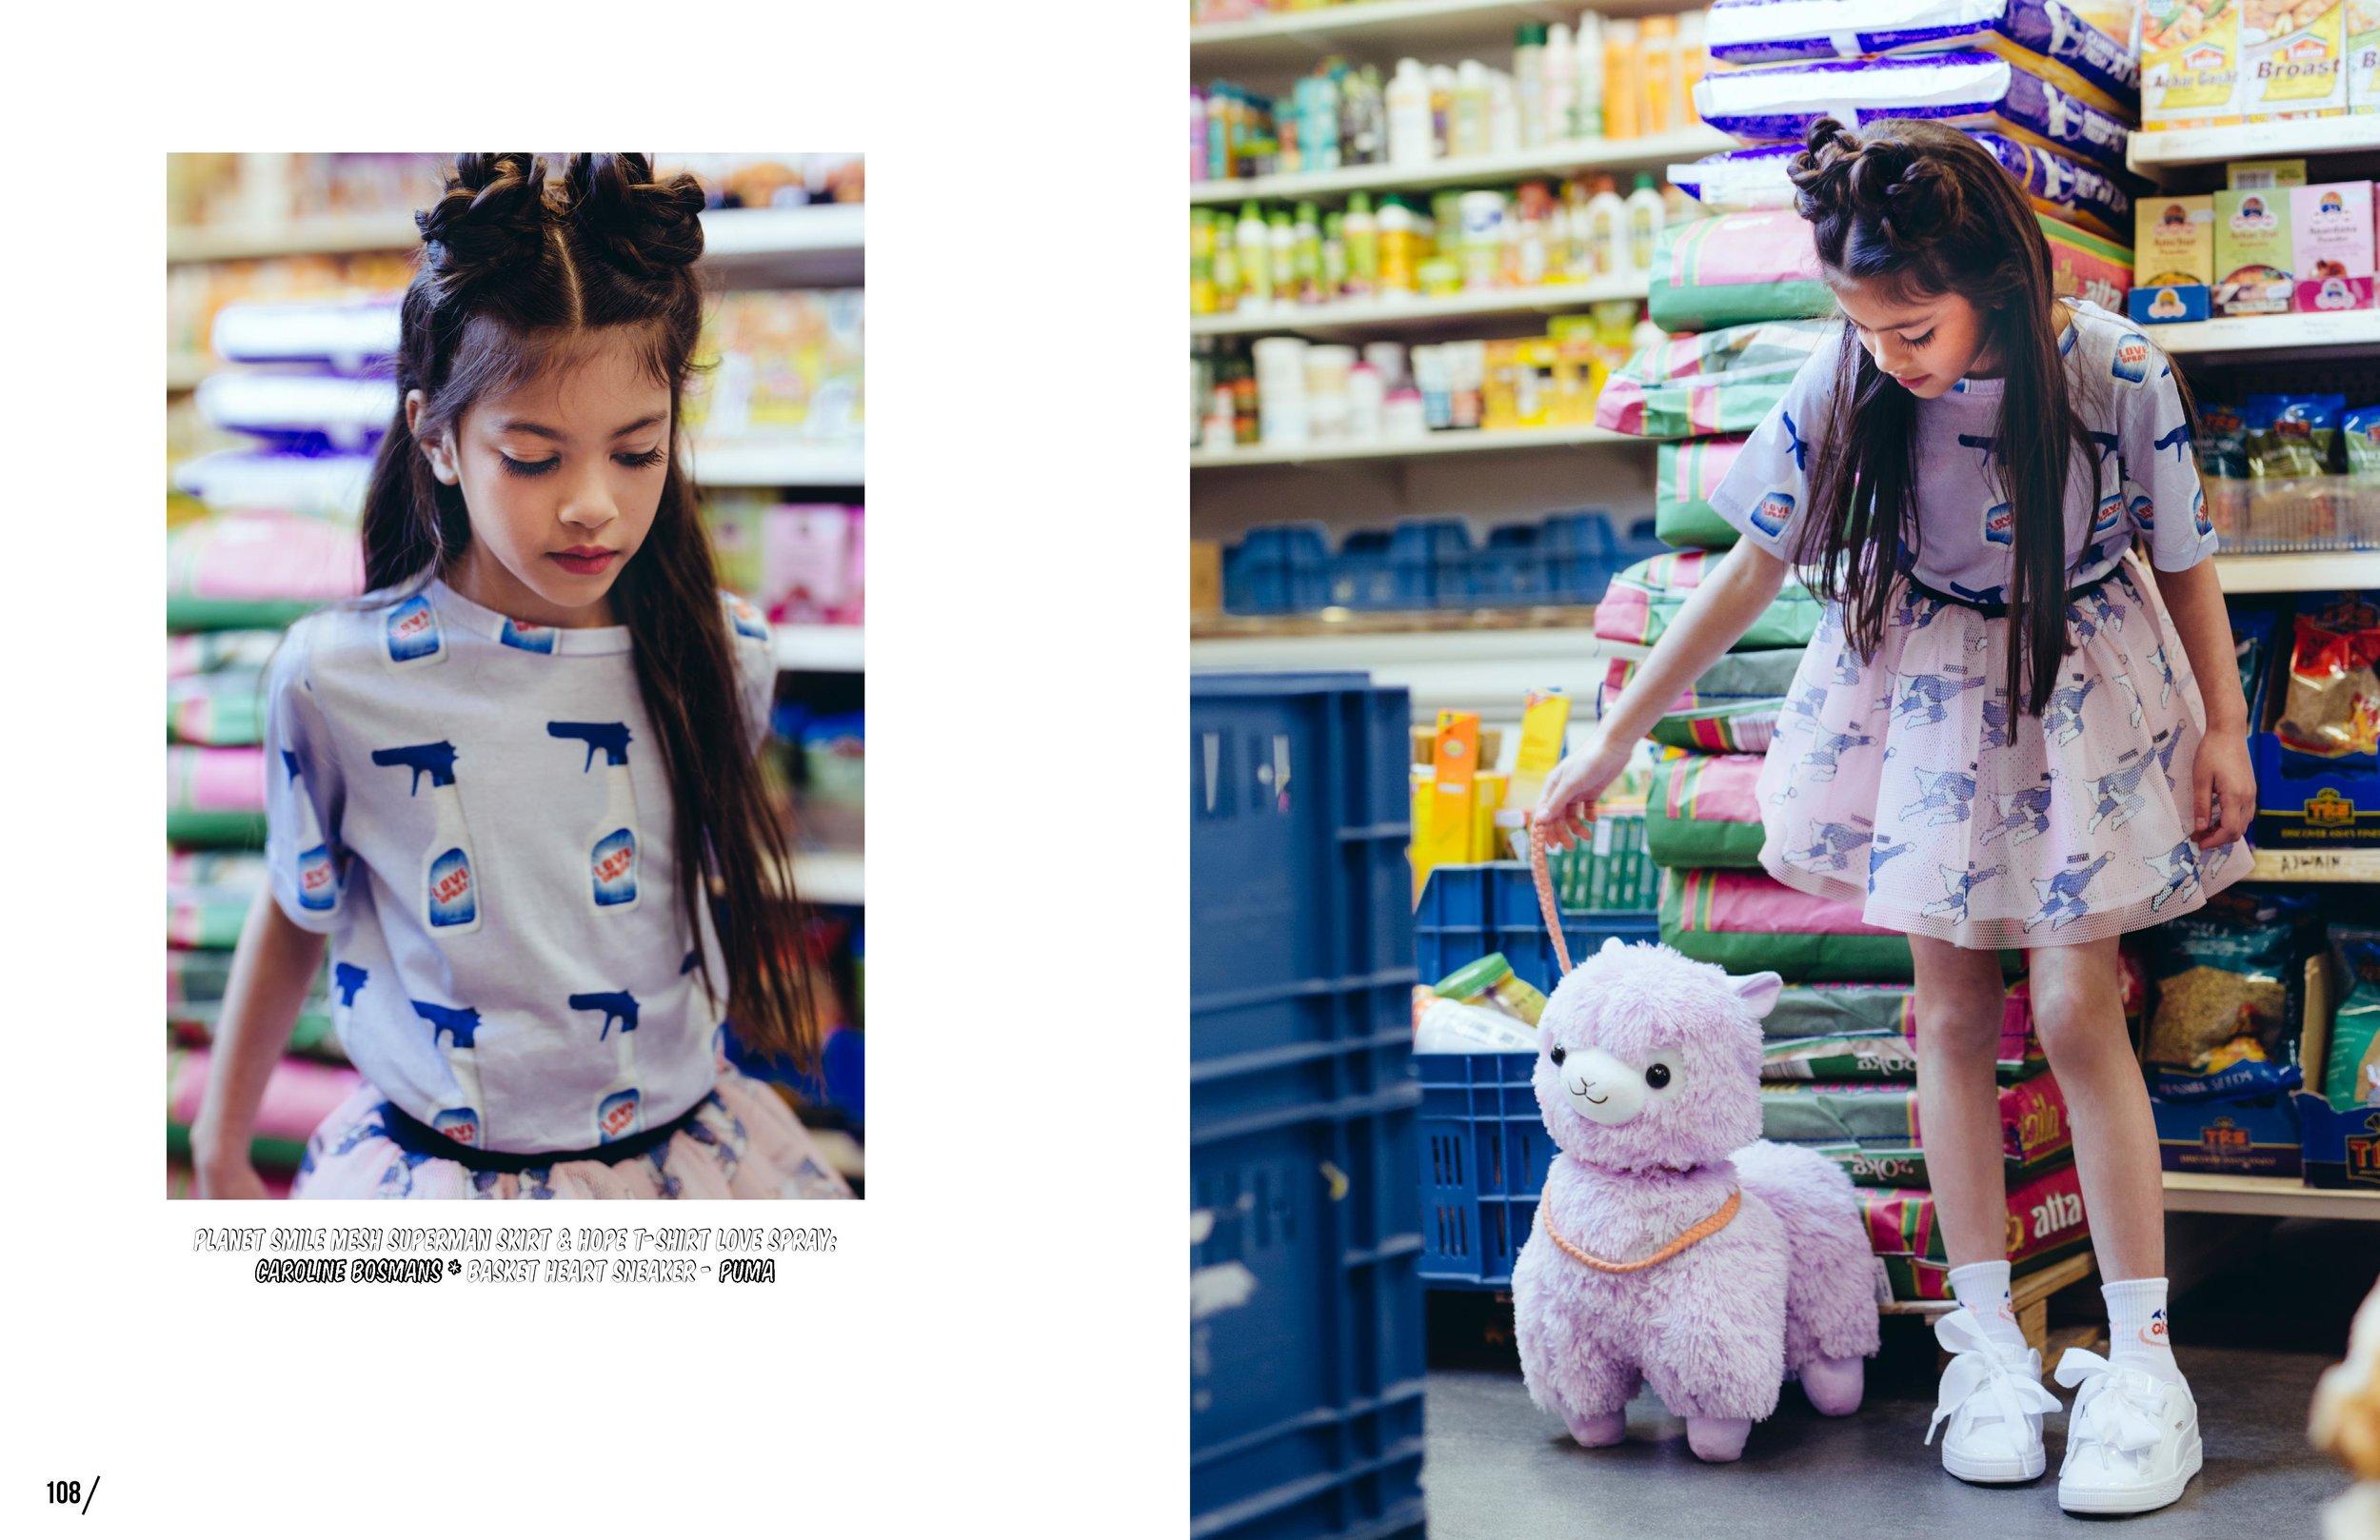 Summer2017-shoppingforlove-page-003.jpg